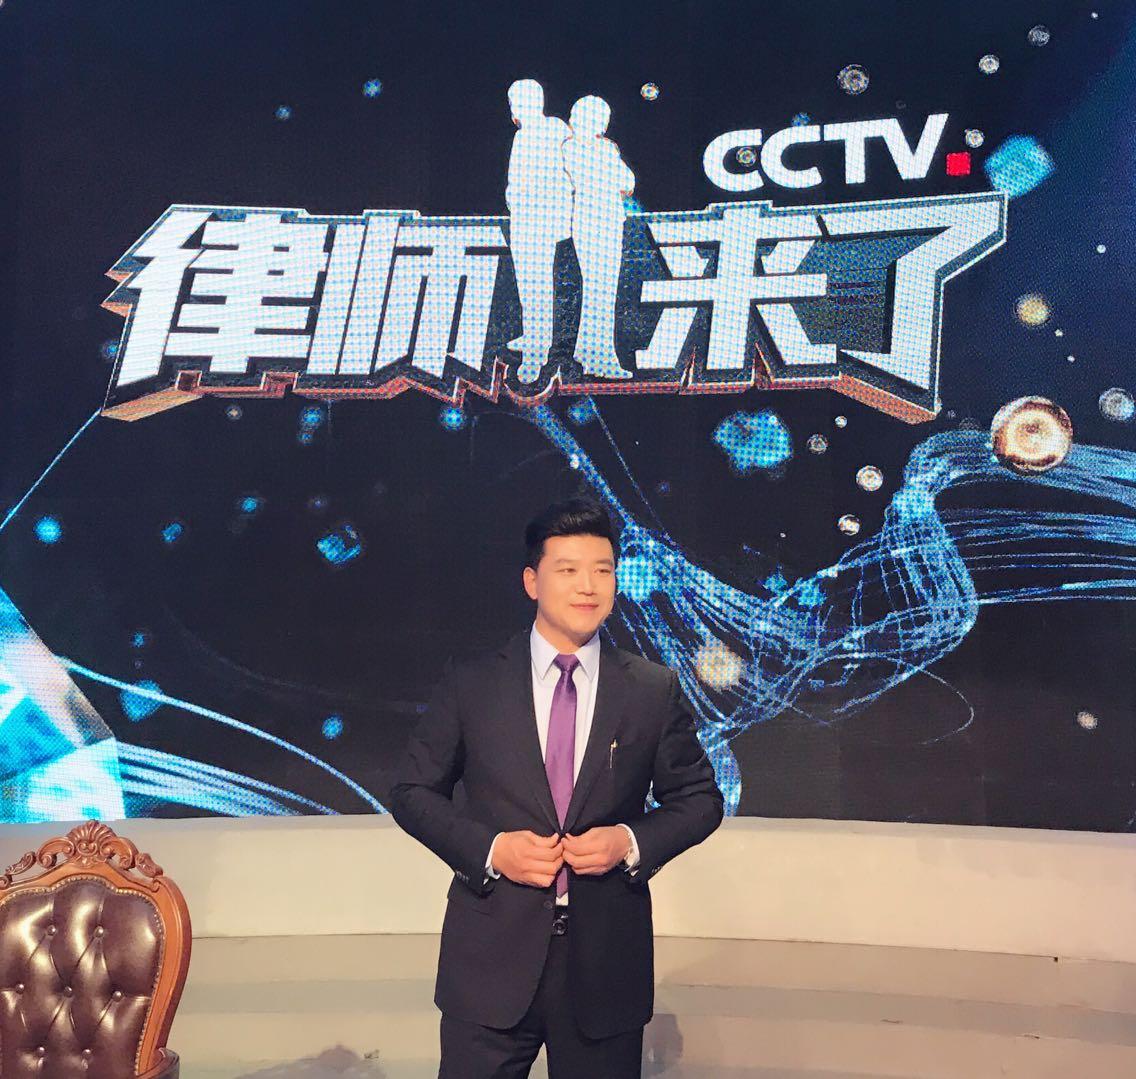 CCTV-12《律师来了》节目现场录制